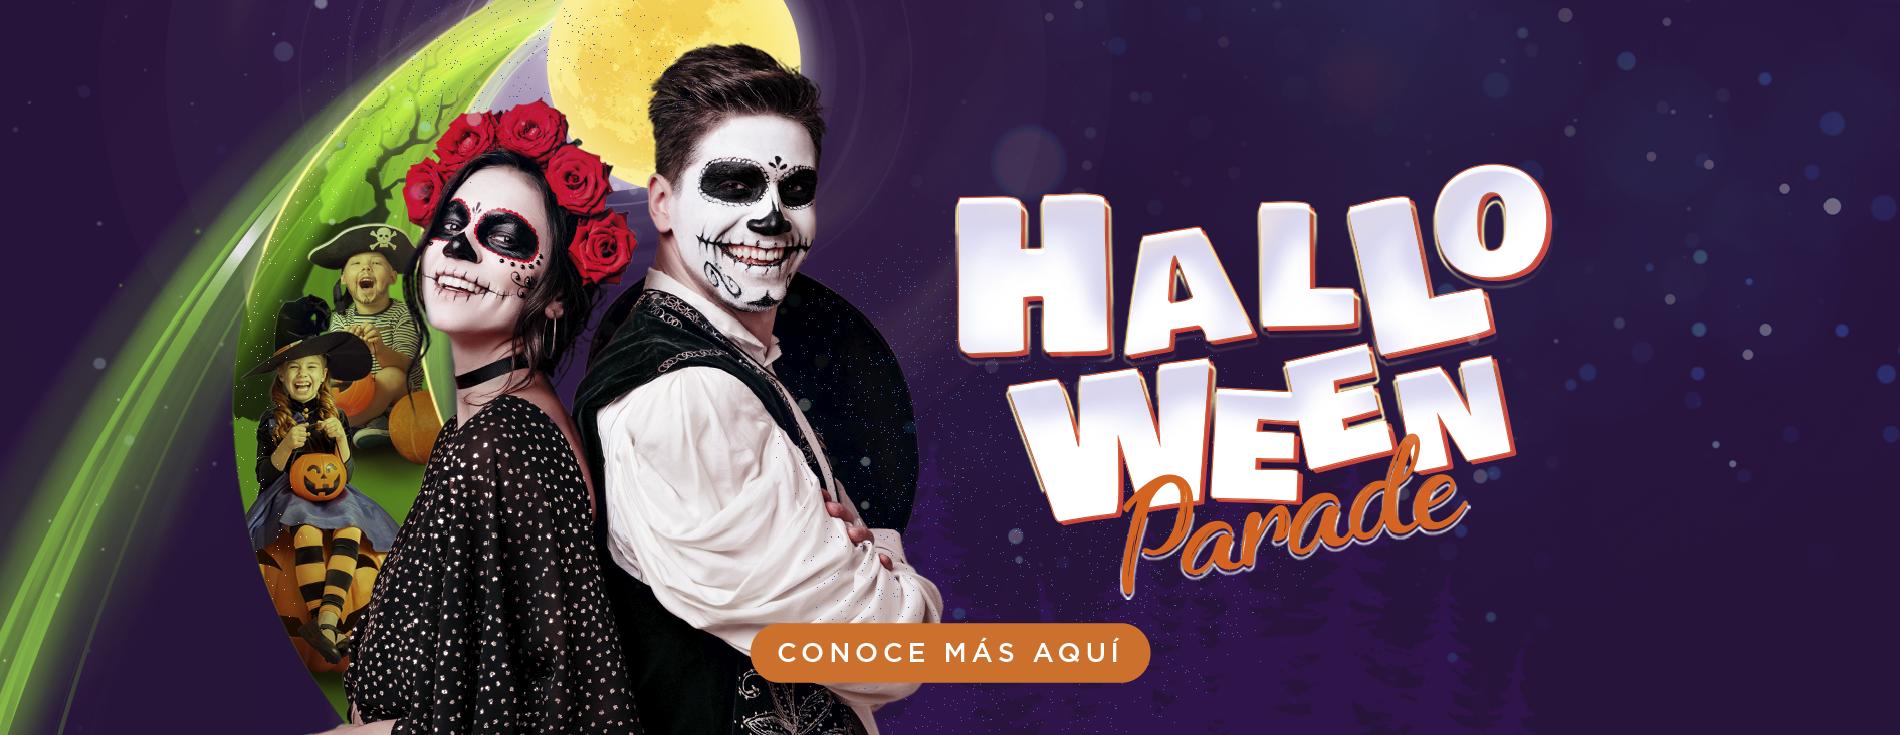 Halloween Parade - Barranquilla